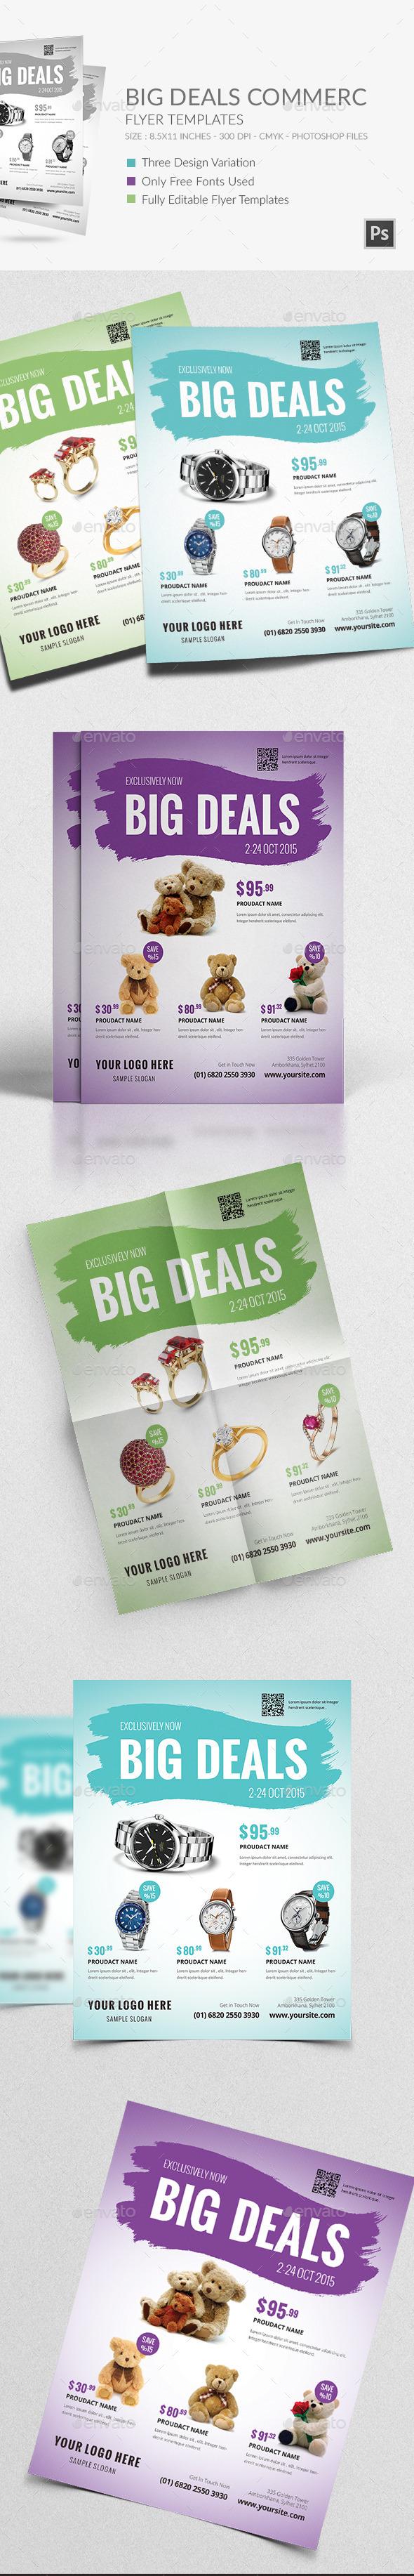 Big Deals Commerce Flyer Template - Commerce Flyers